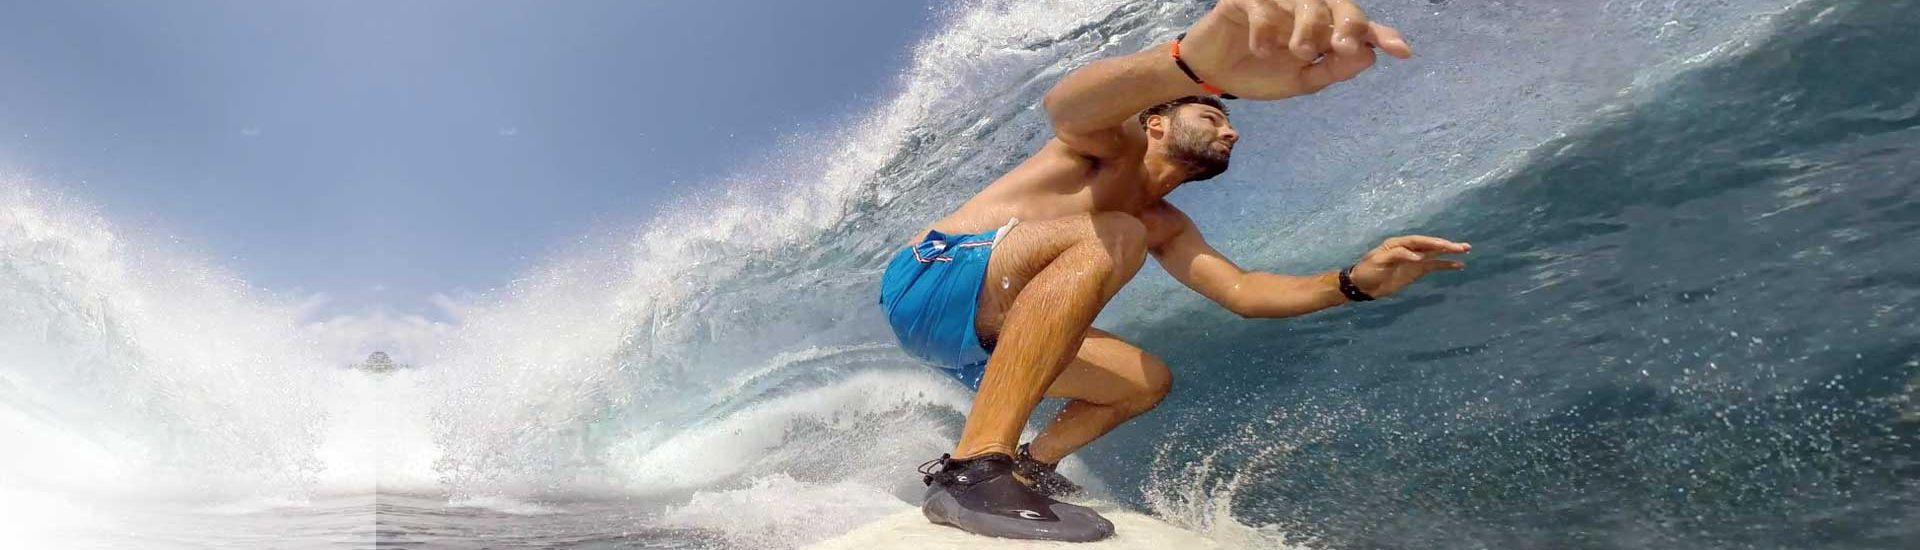 Abono Surf 22